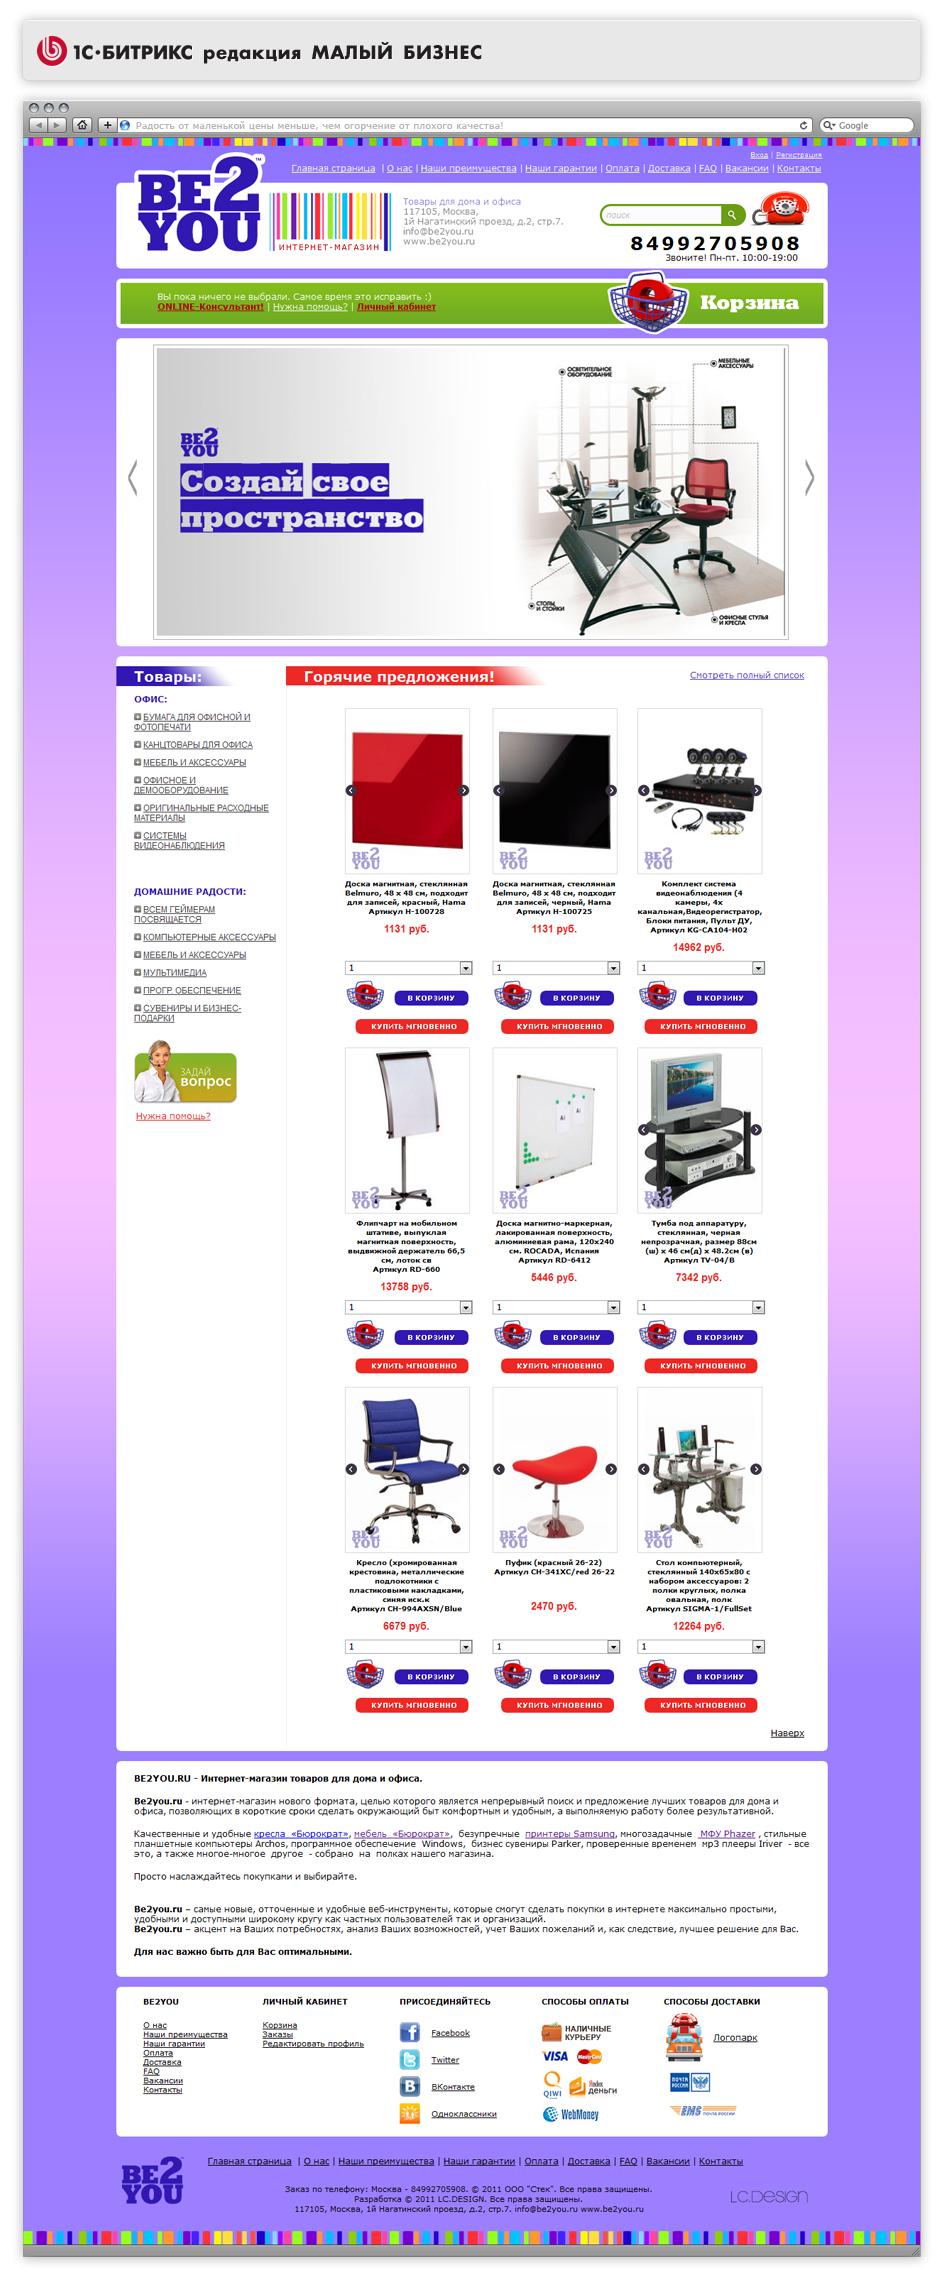 Be2You.ru интернет магазин на Битрикс ред. Малый Бизнес